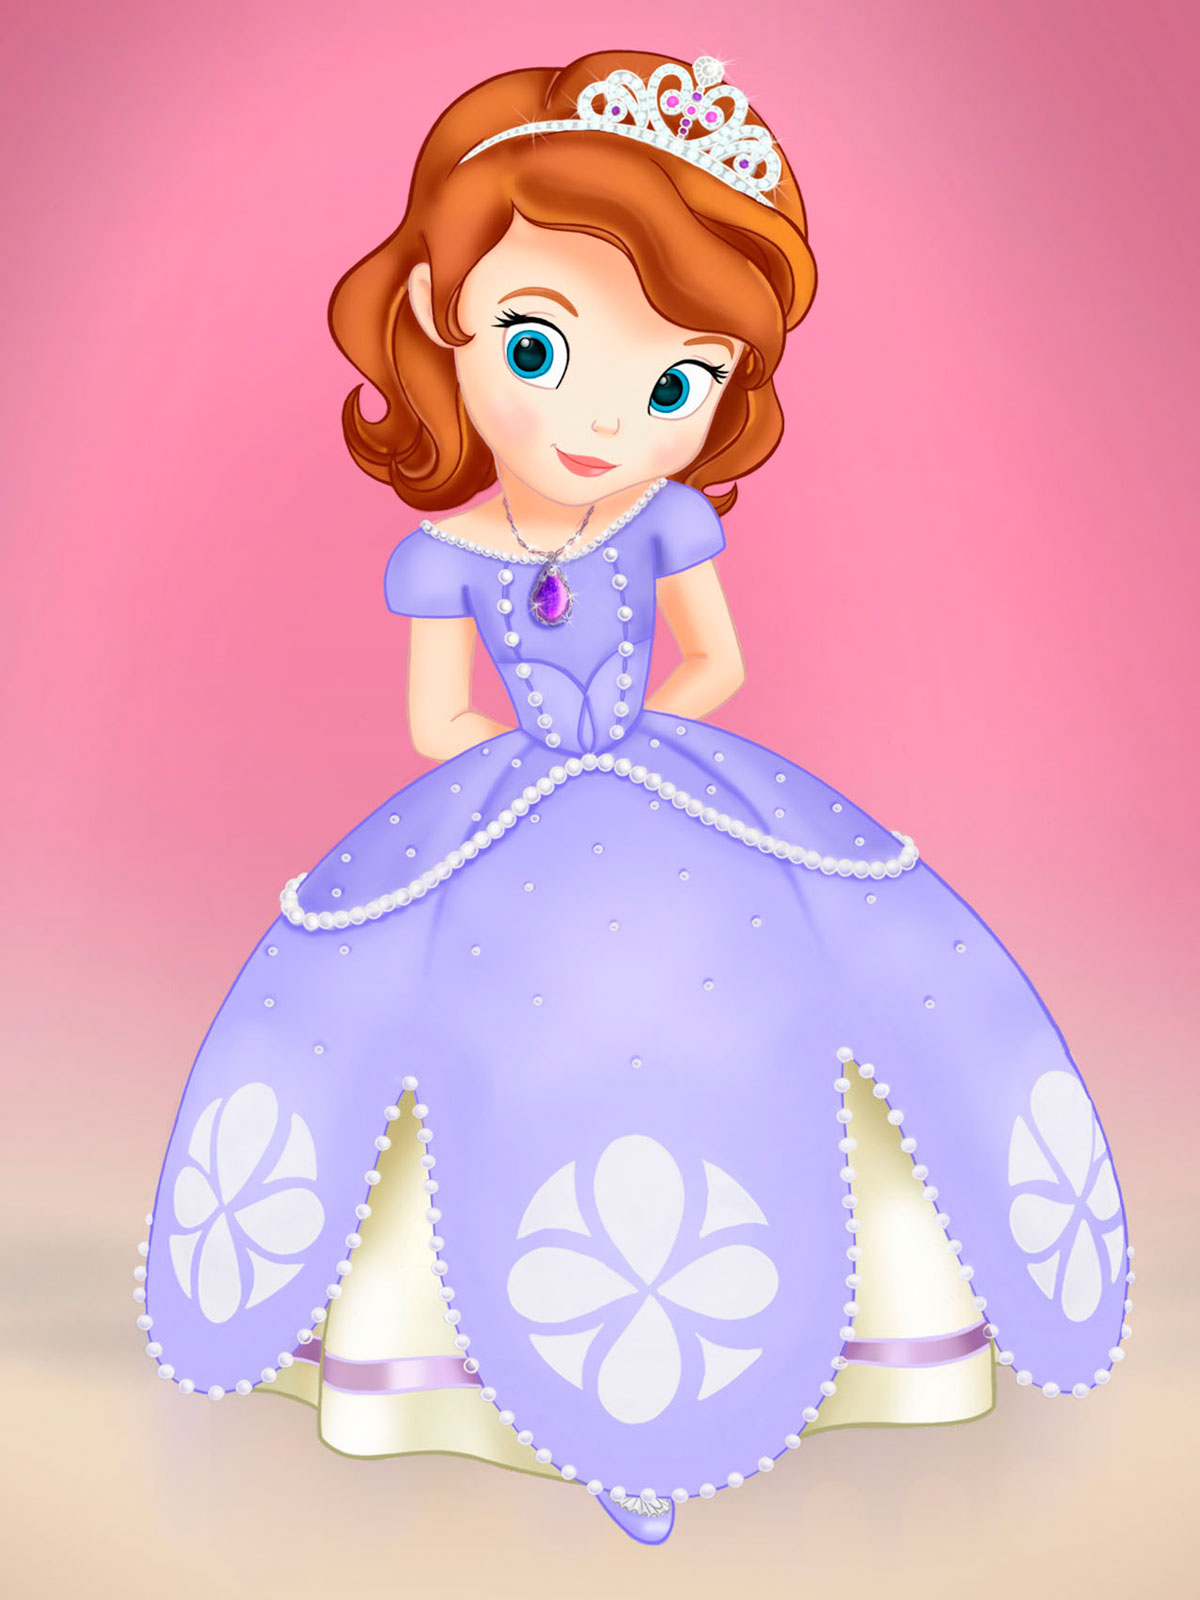 La princesa sof a serie 2012 - Foto princesa sofia ...